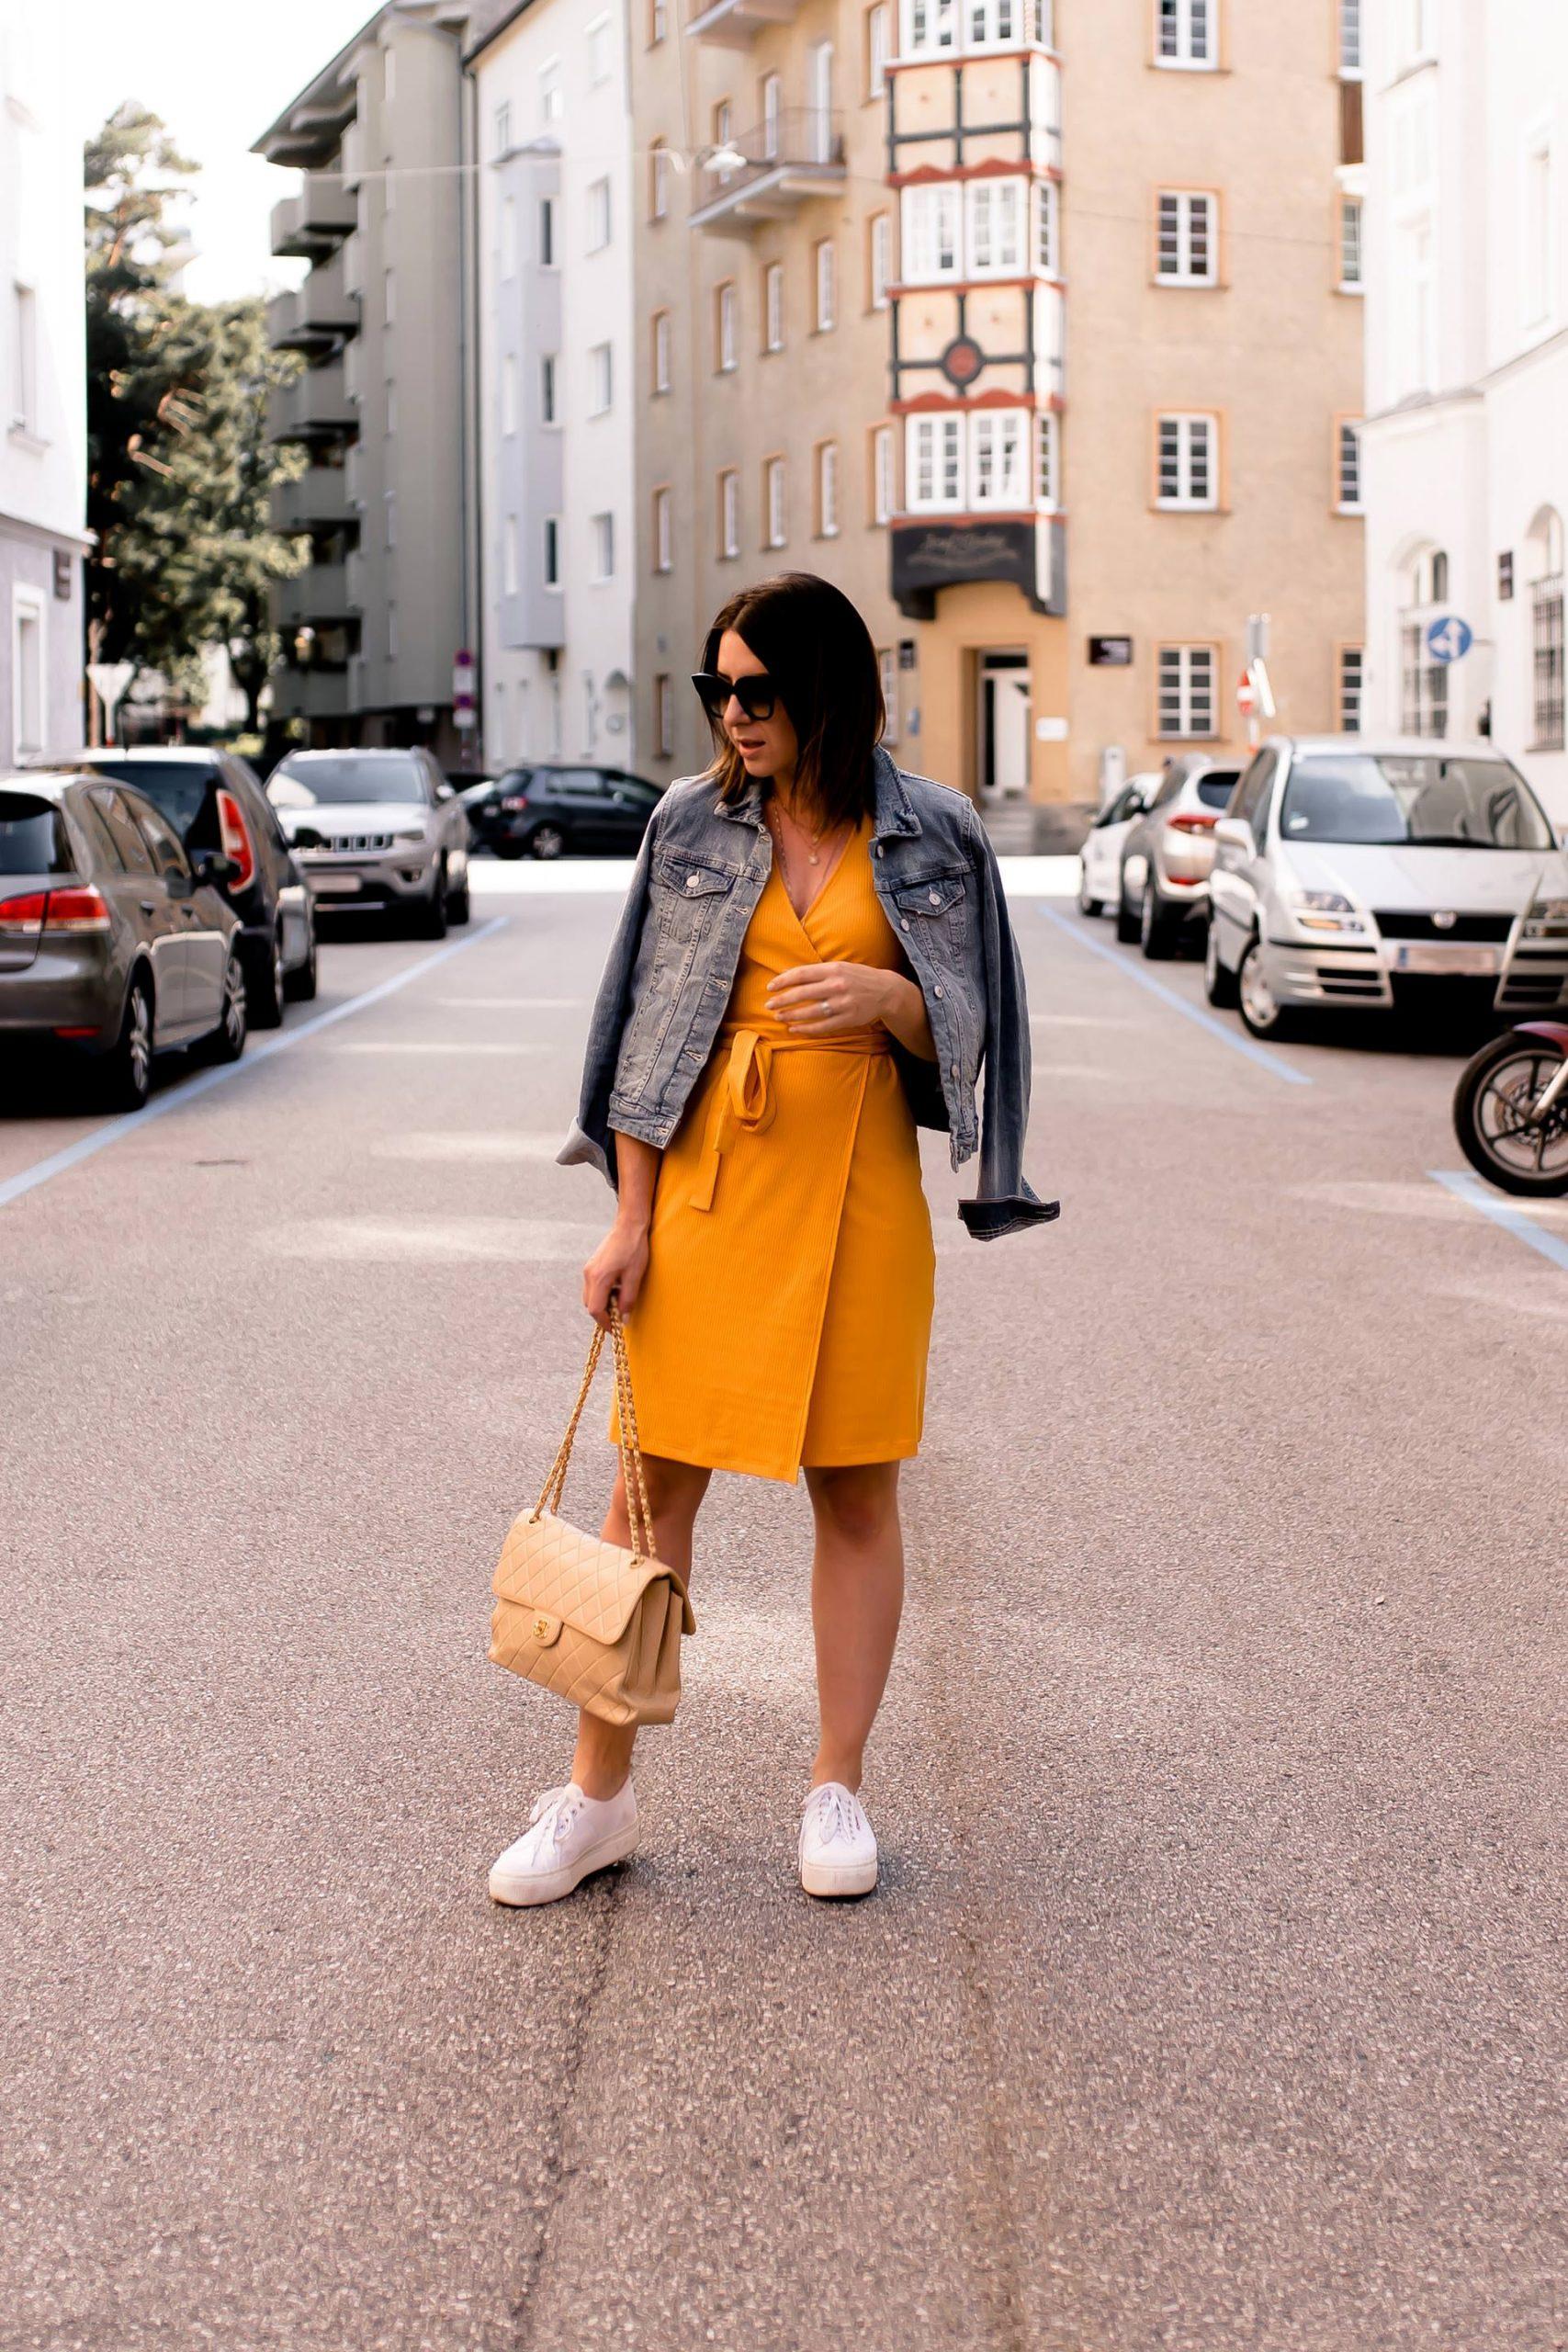 13 Coolste Abendkleid Jacke Kombinieren DesignDesigner Schön Abendkleid Jacke Kombinieren Boutique